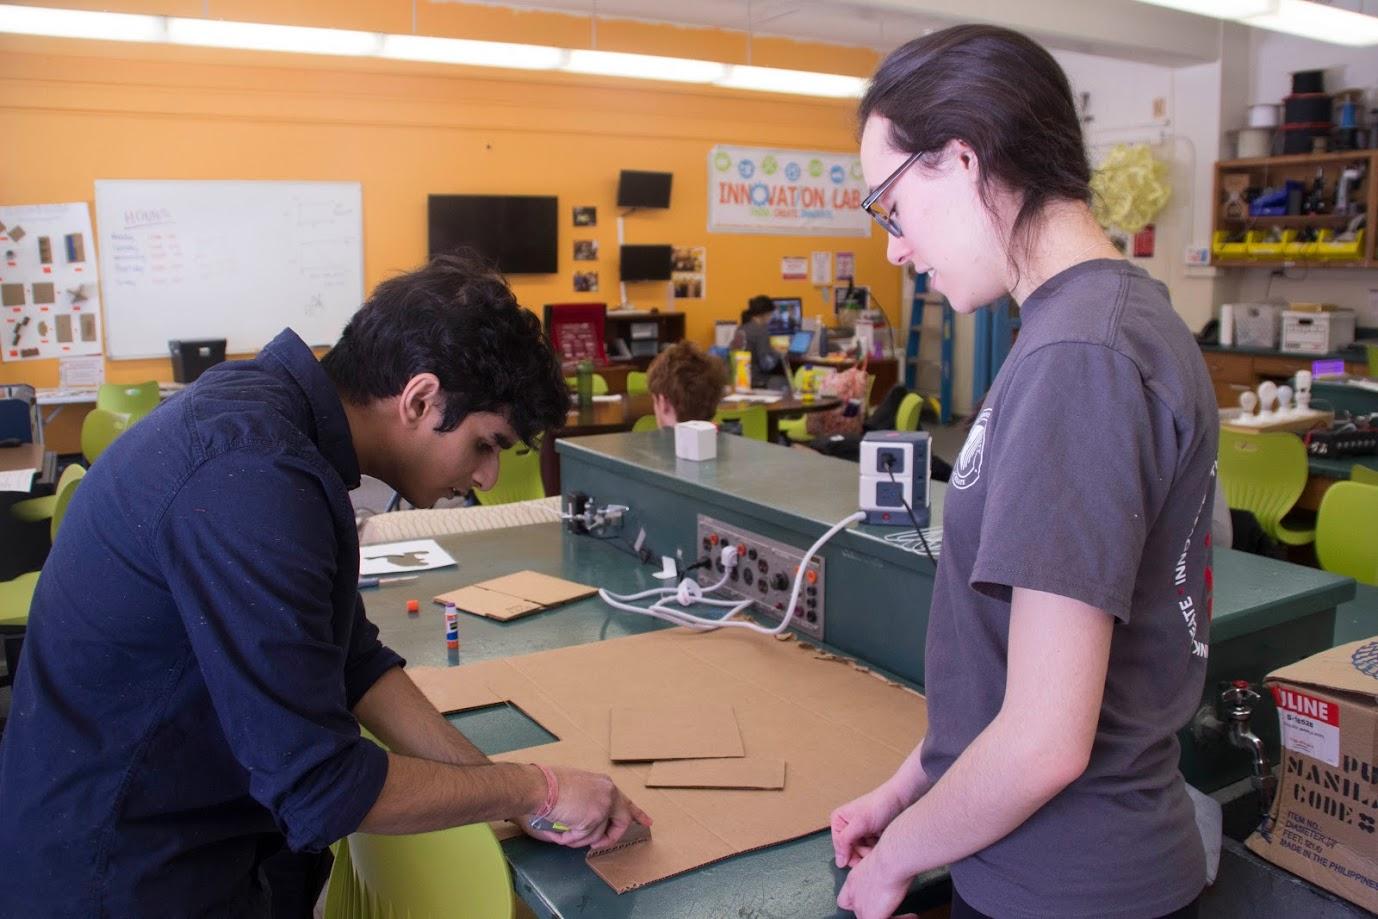 Stony Brook University Innovation Lab gives students tools to create